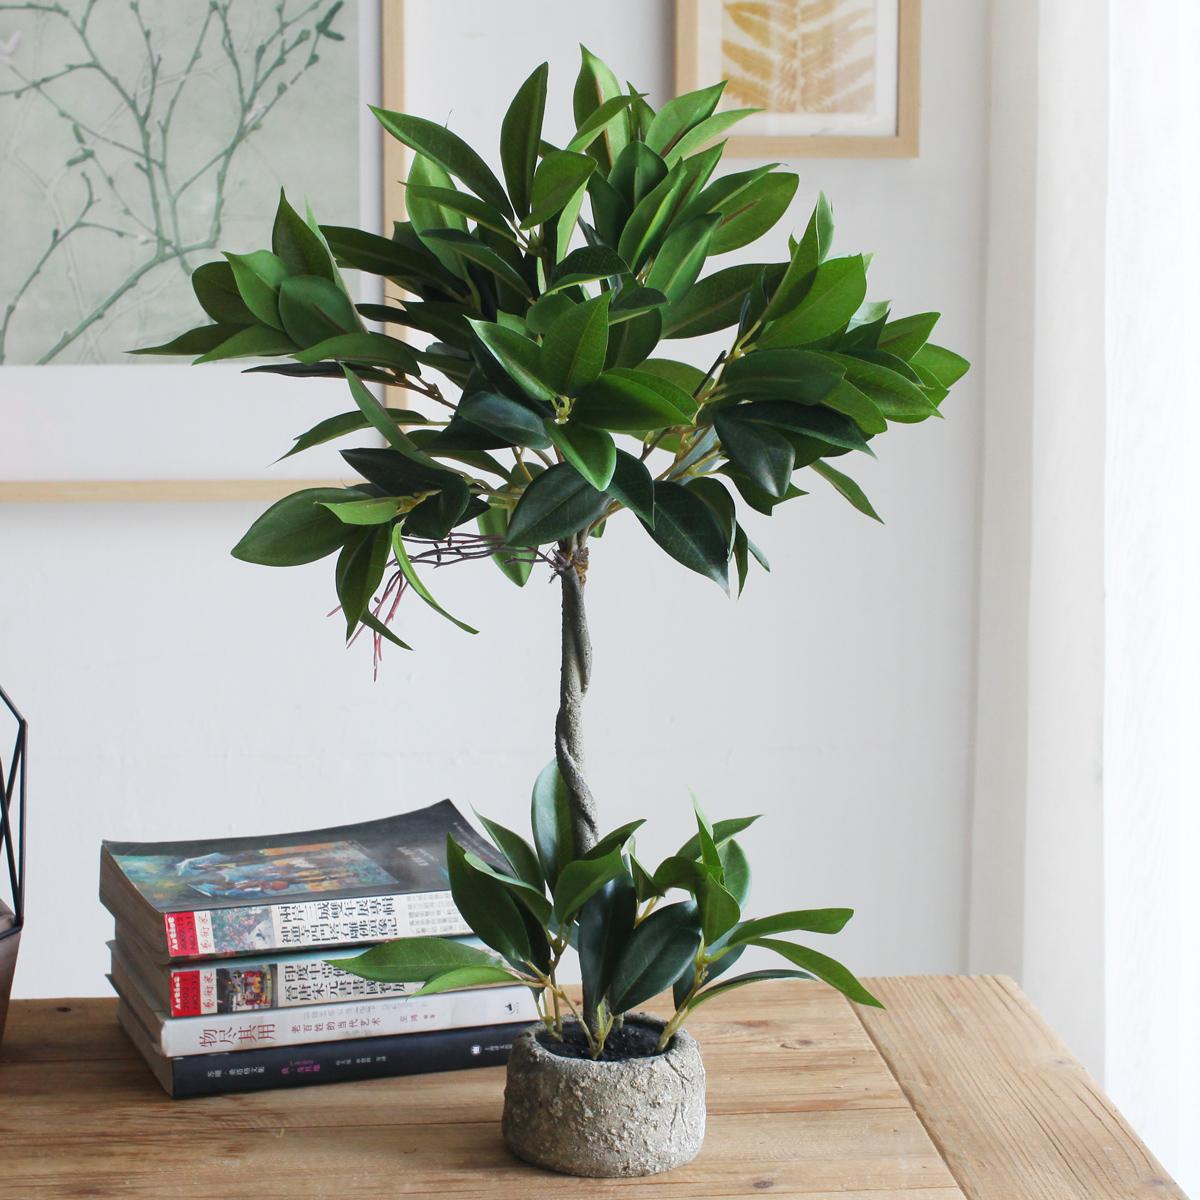 office bonsai. Sicily Plants Simulation Green Plant Laurel Leaf Potted Fern Bonsai Office Decorative Tree Ornaments